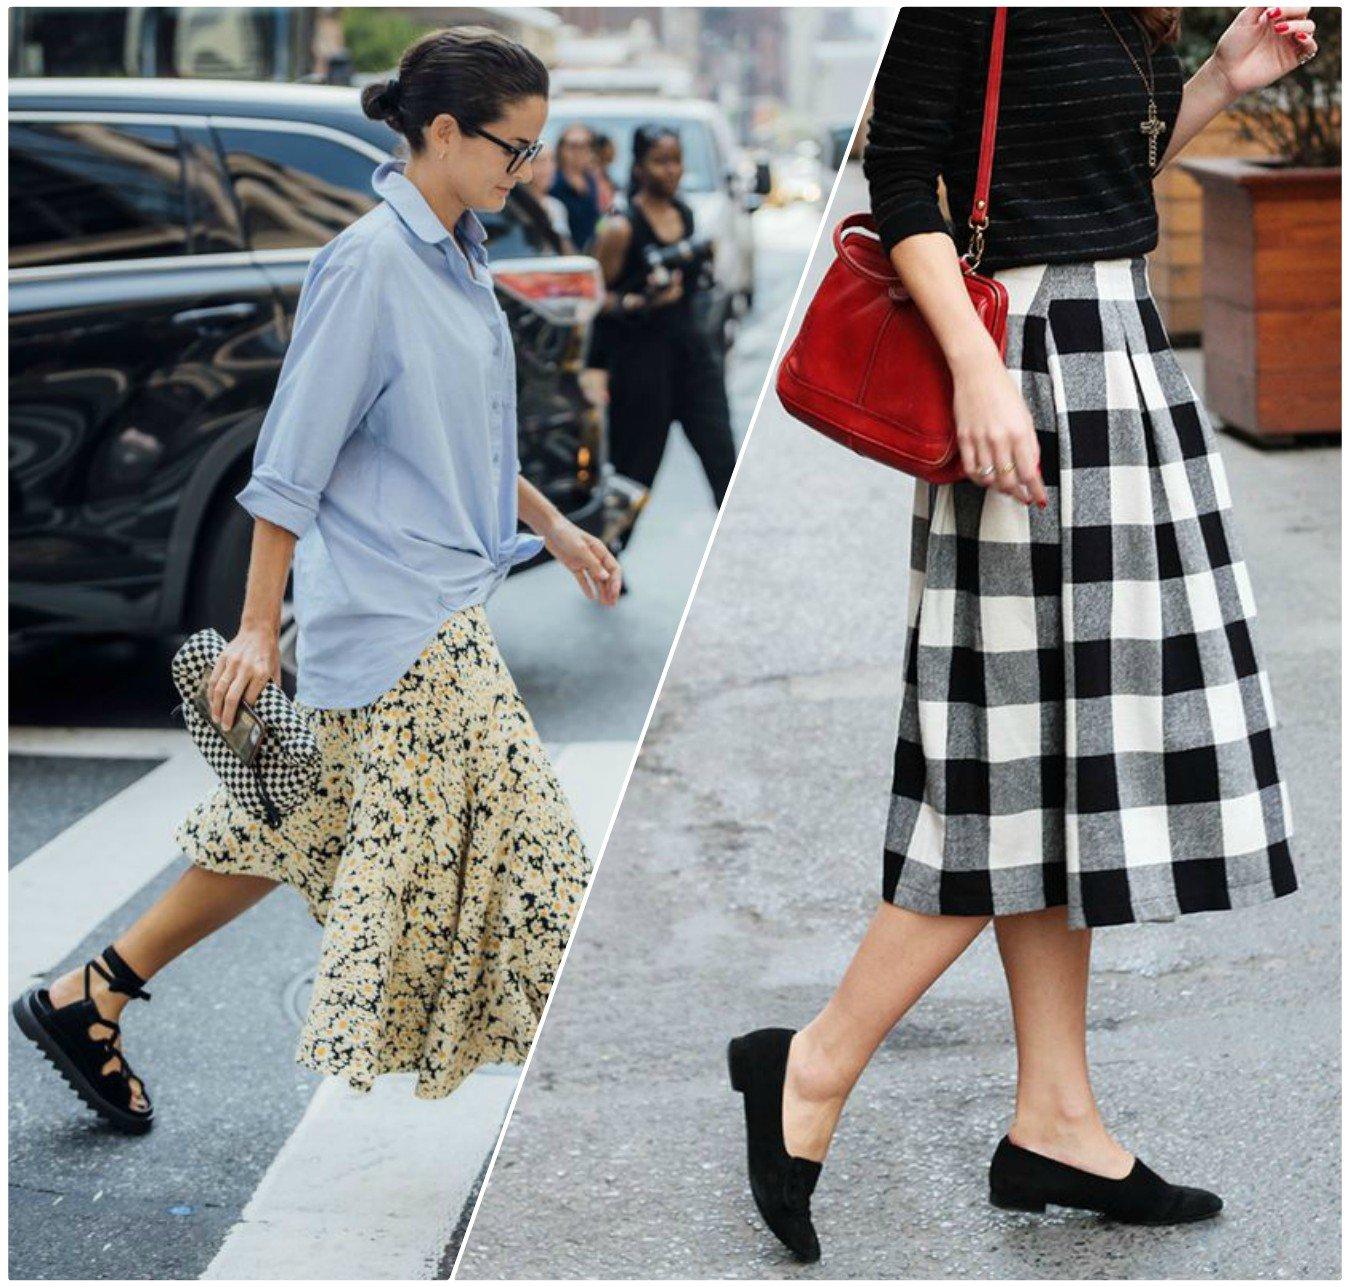 Sydney vs. Melbourne: The Latest Fashion & Style Trends   Style & Life by Susana